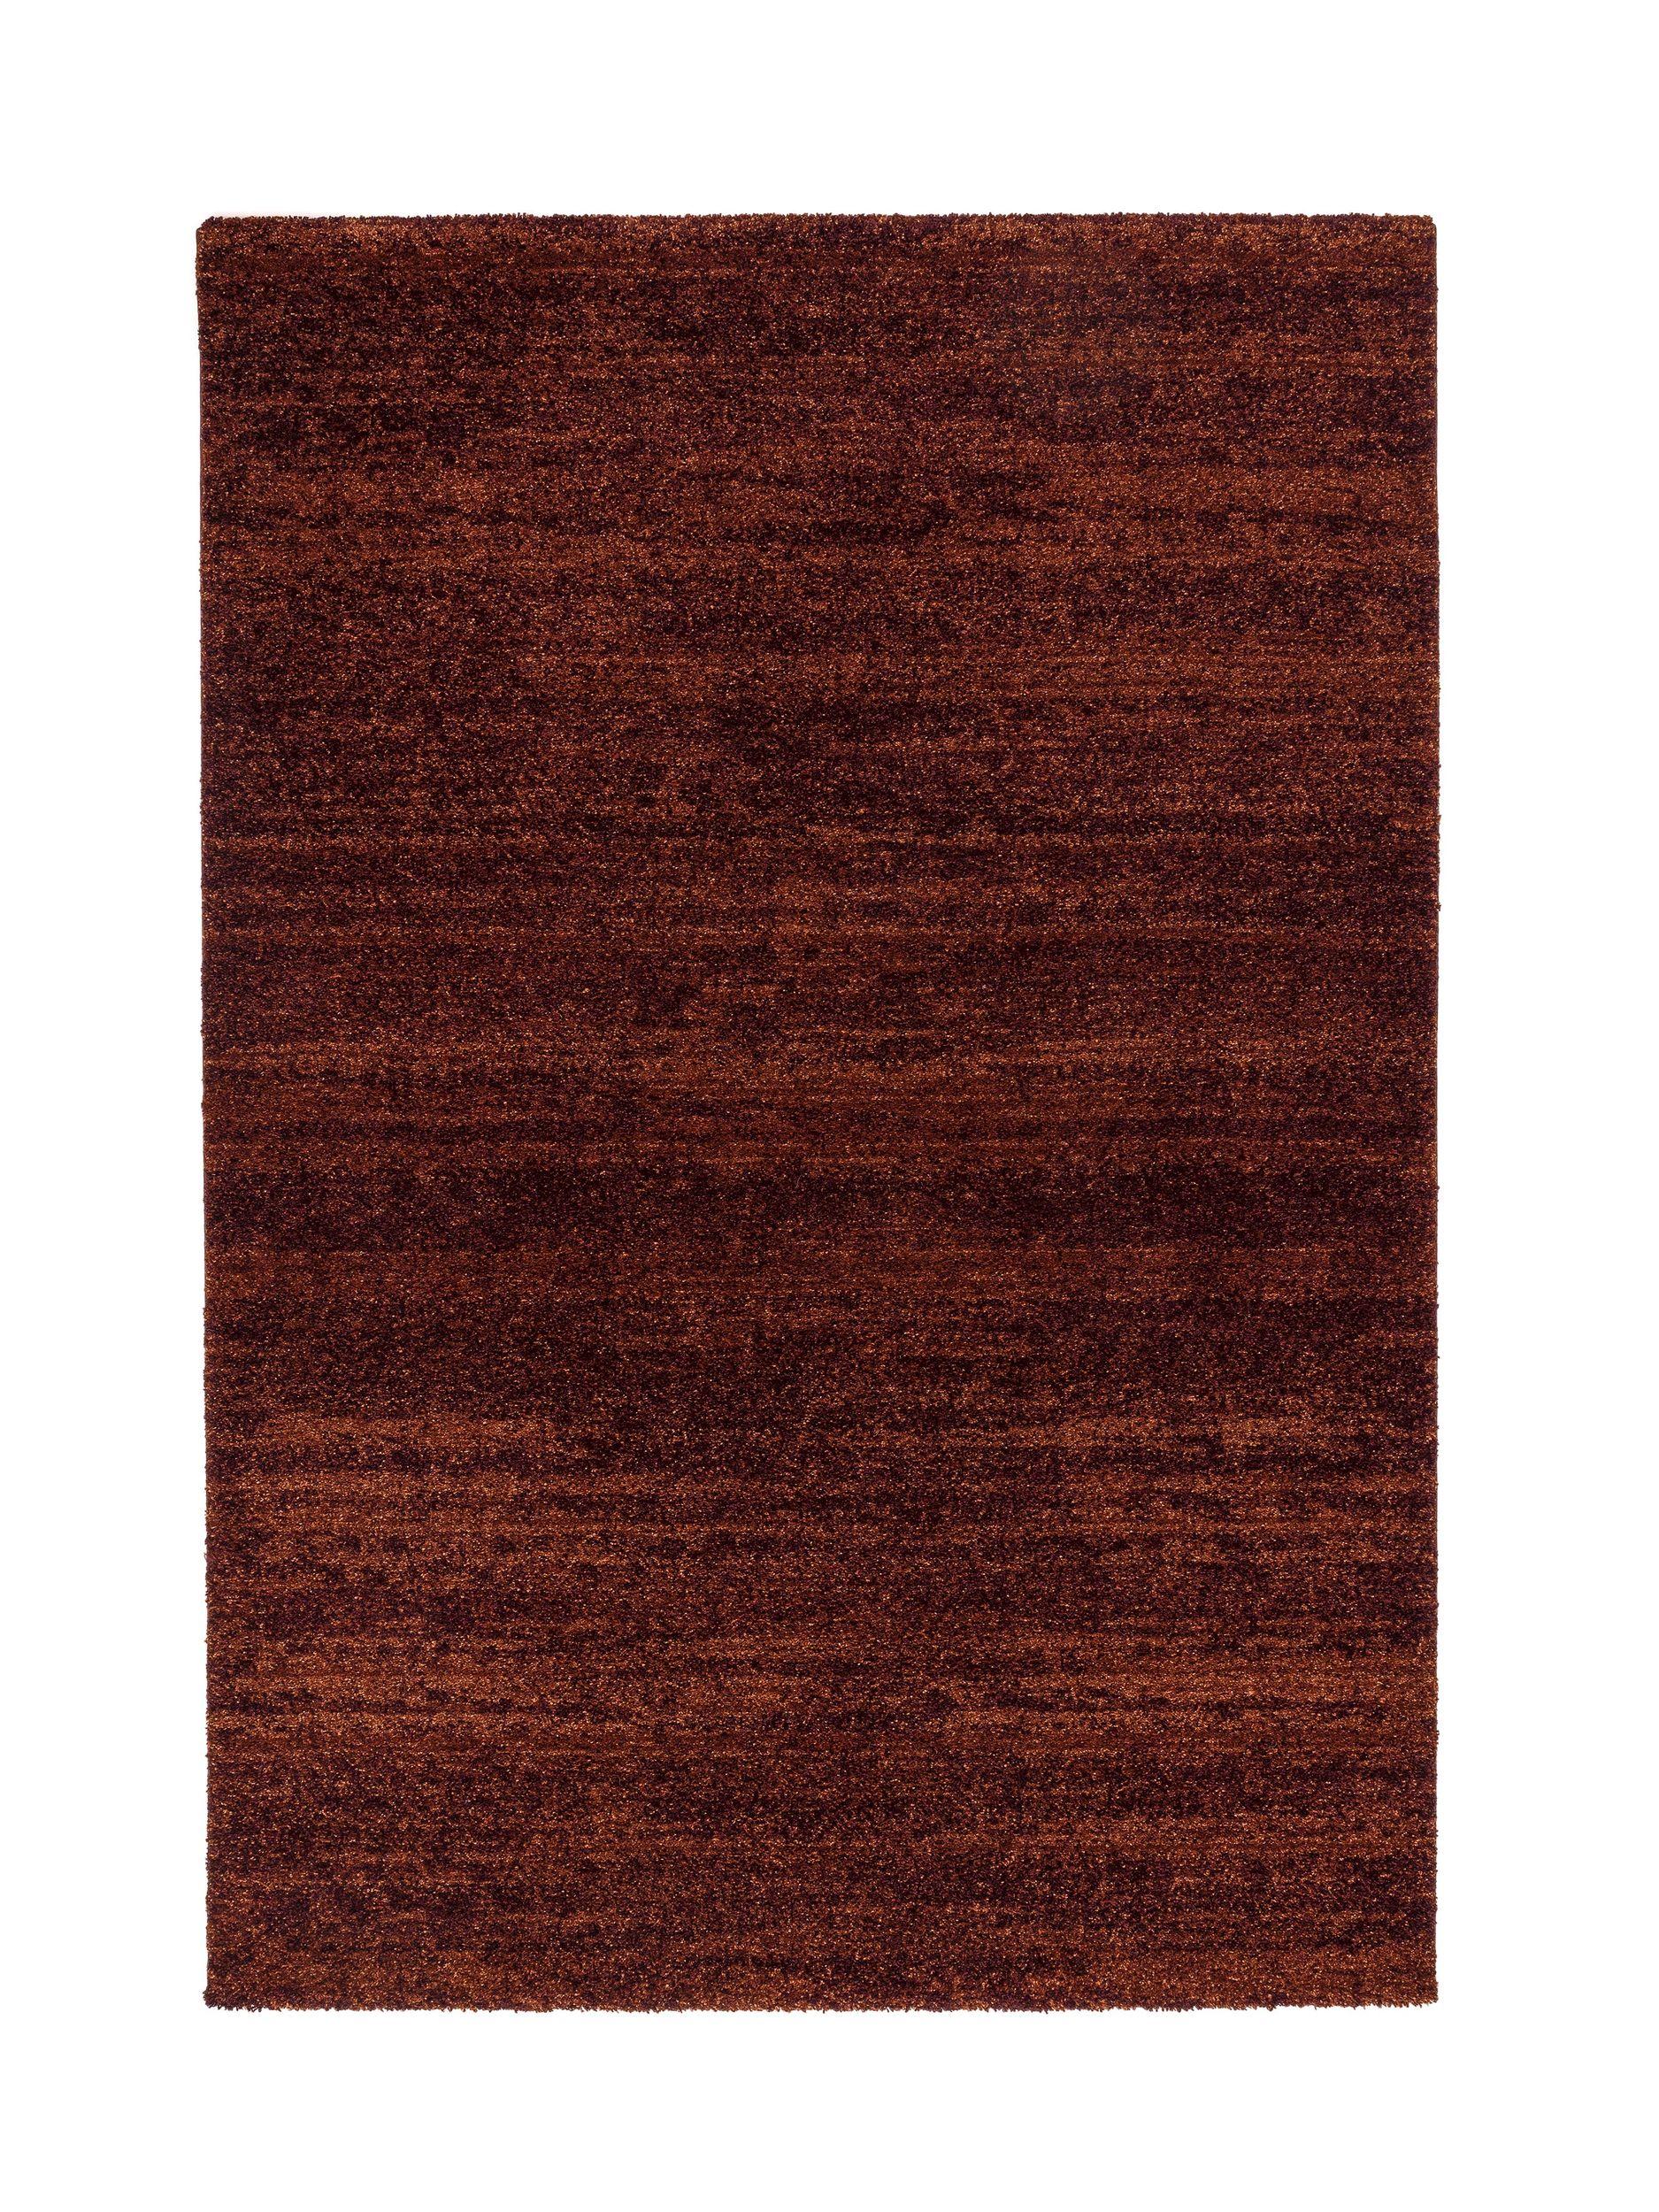 Teppich 67x130cm wm SAMOA MELANGE